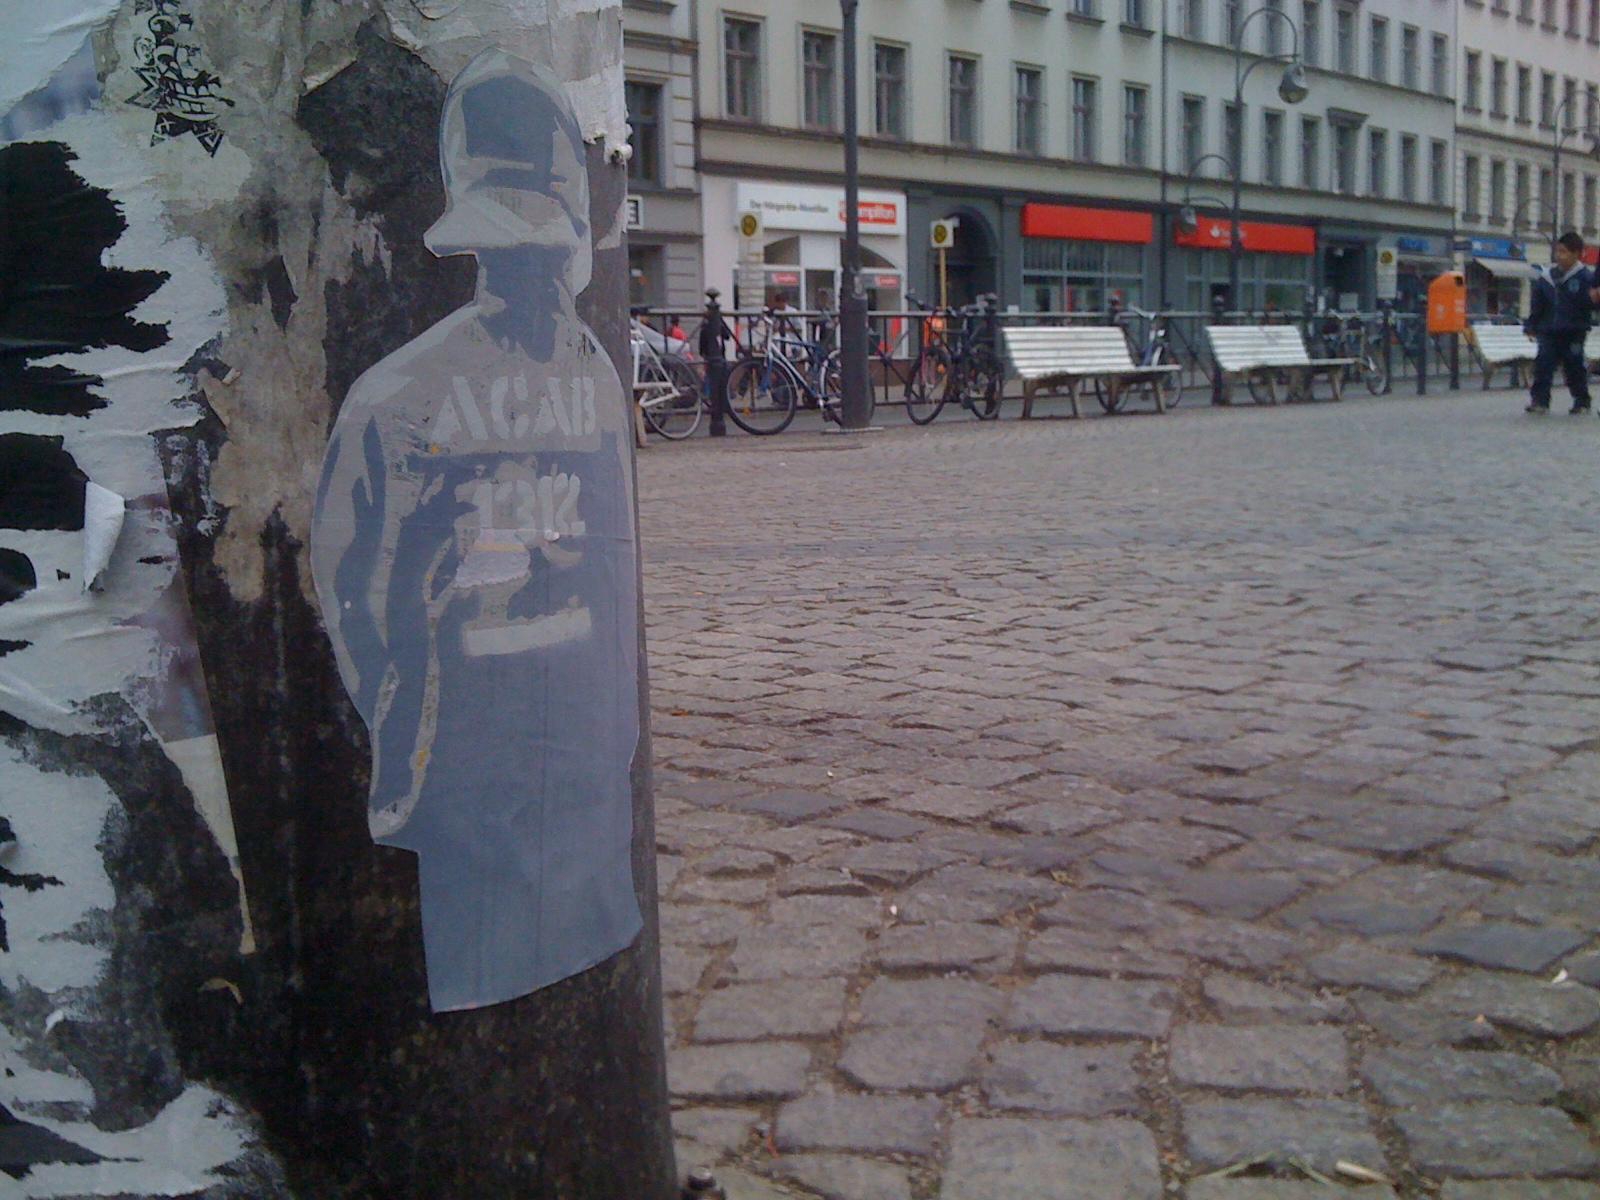 polizist, bulle, acab, 1312, polizei, berlin, riotcop